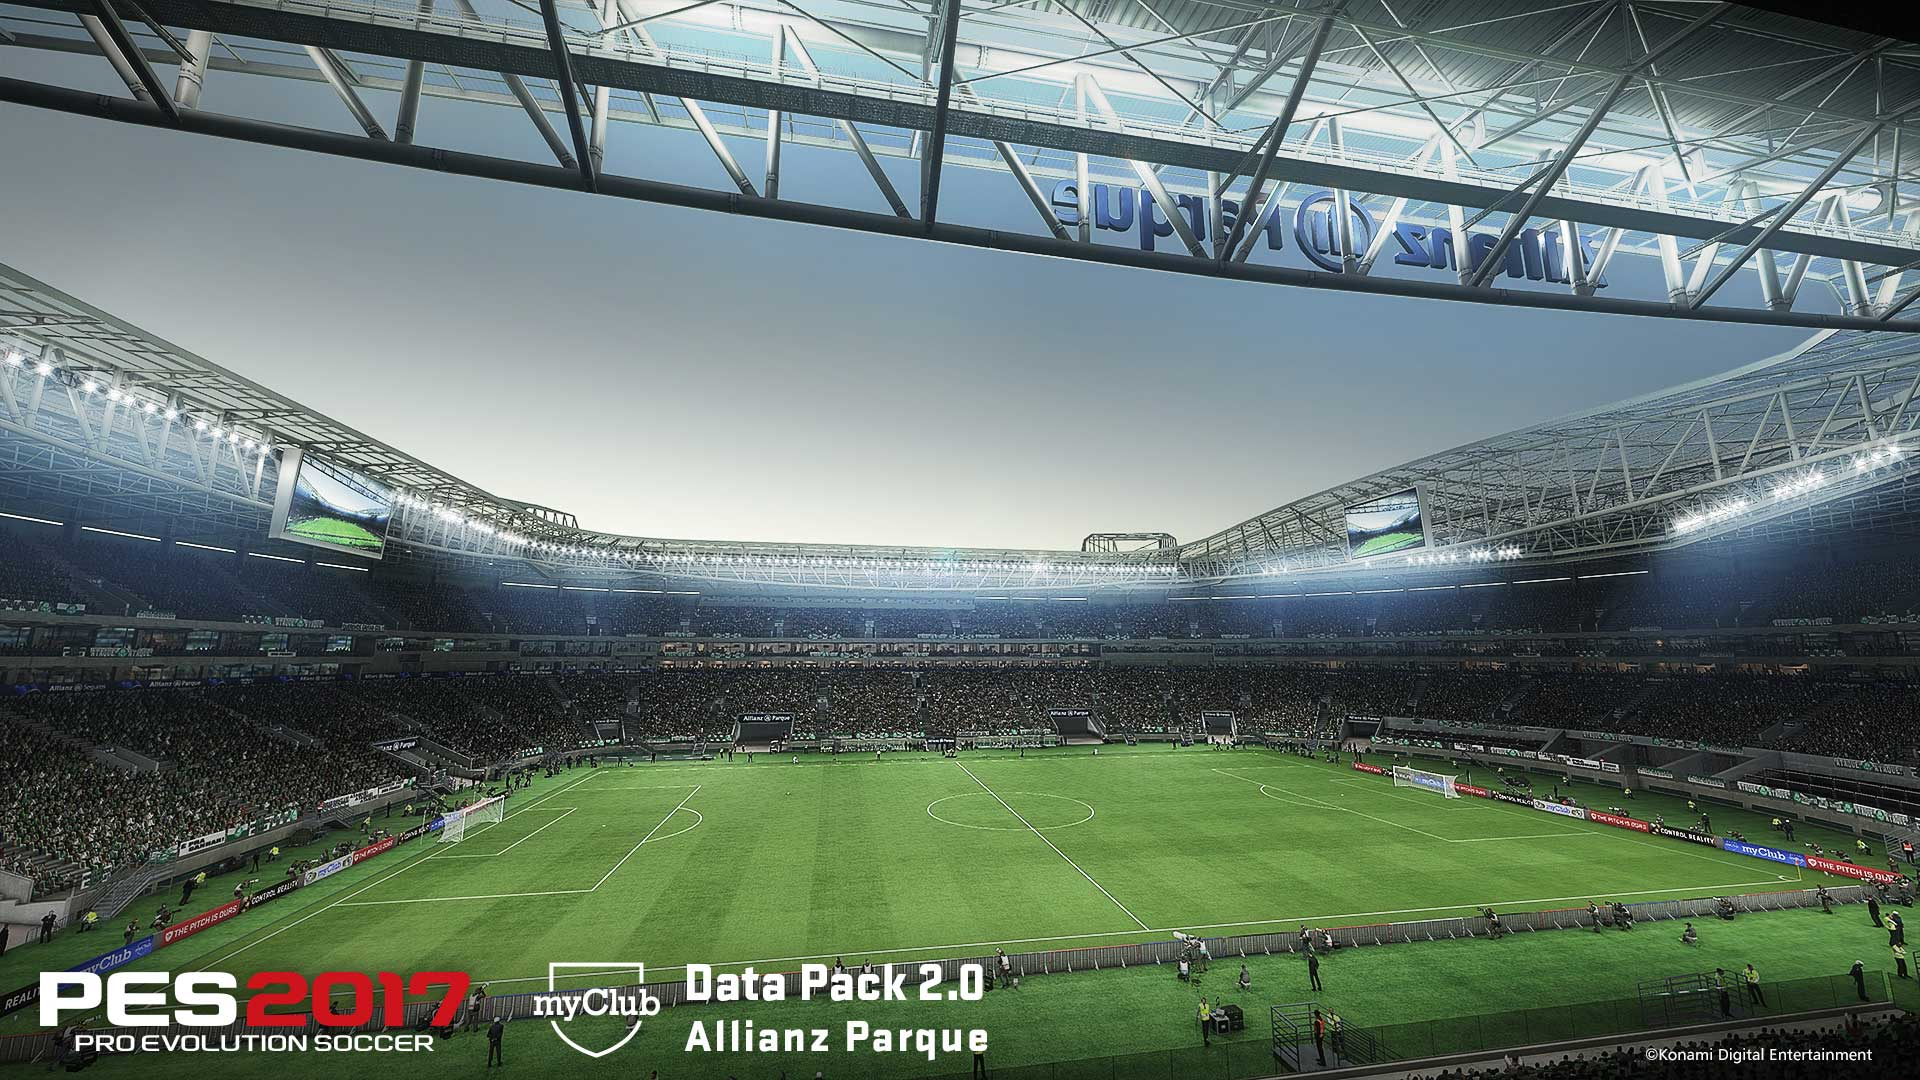 Data Pack 2.0 - Palmeiras Stadium Allianz Parque